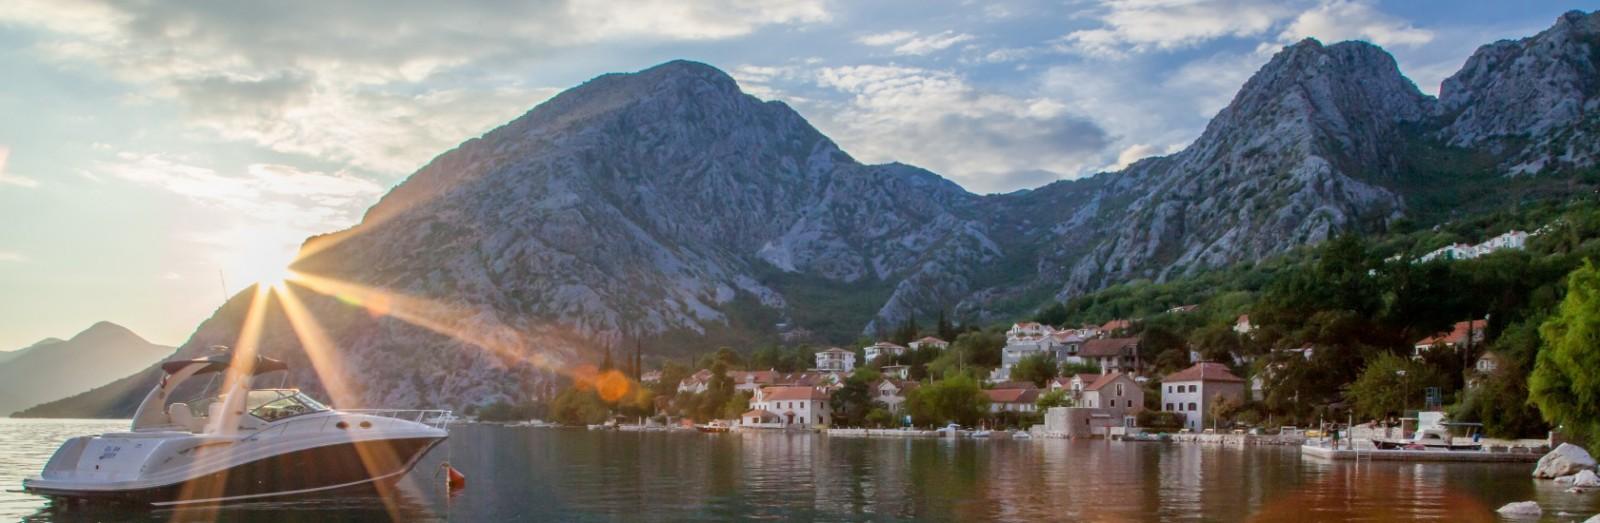 презентация о черногории